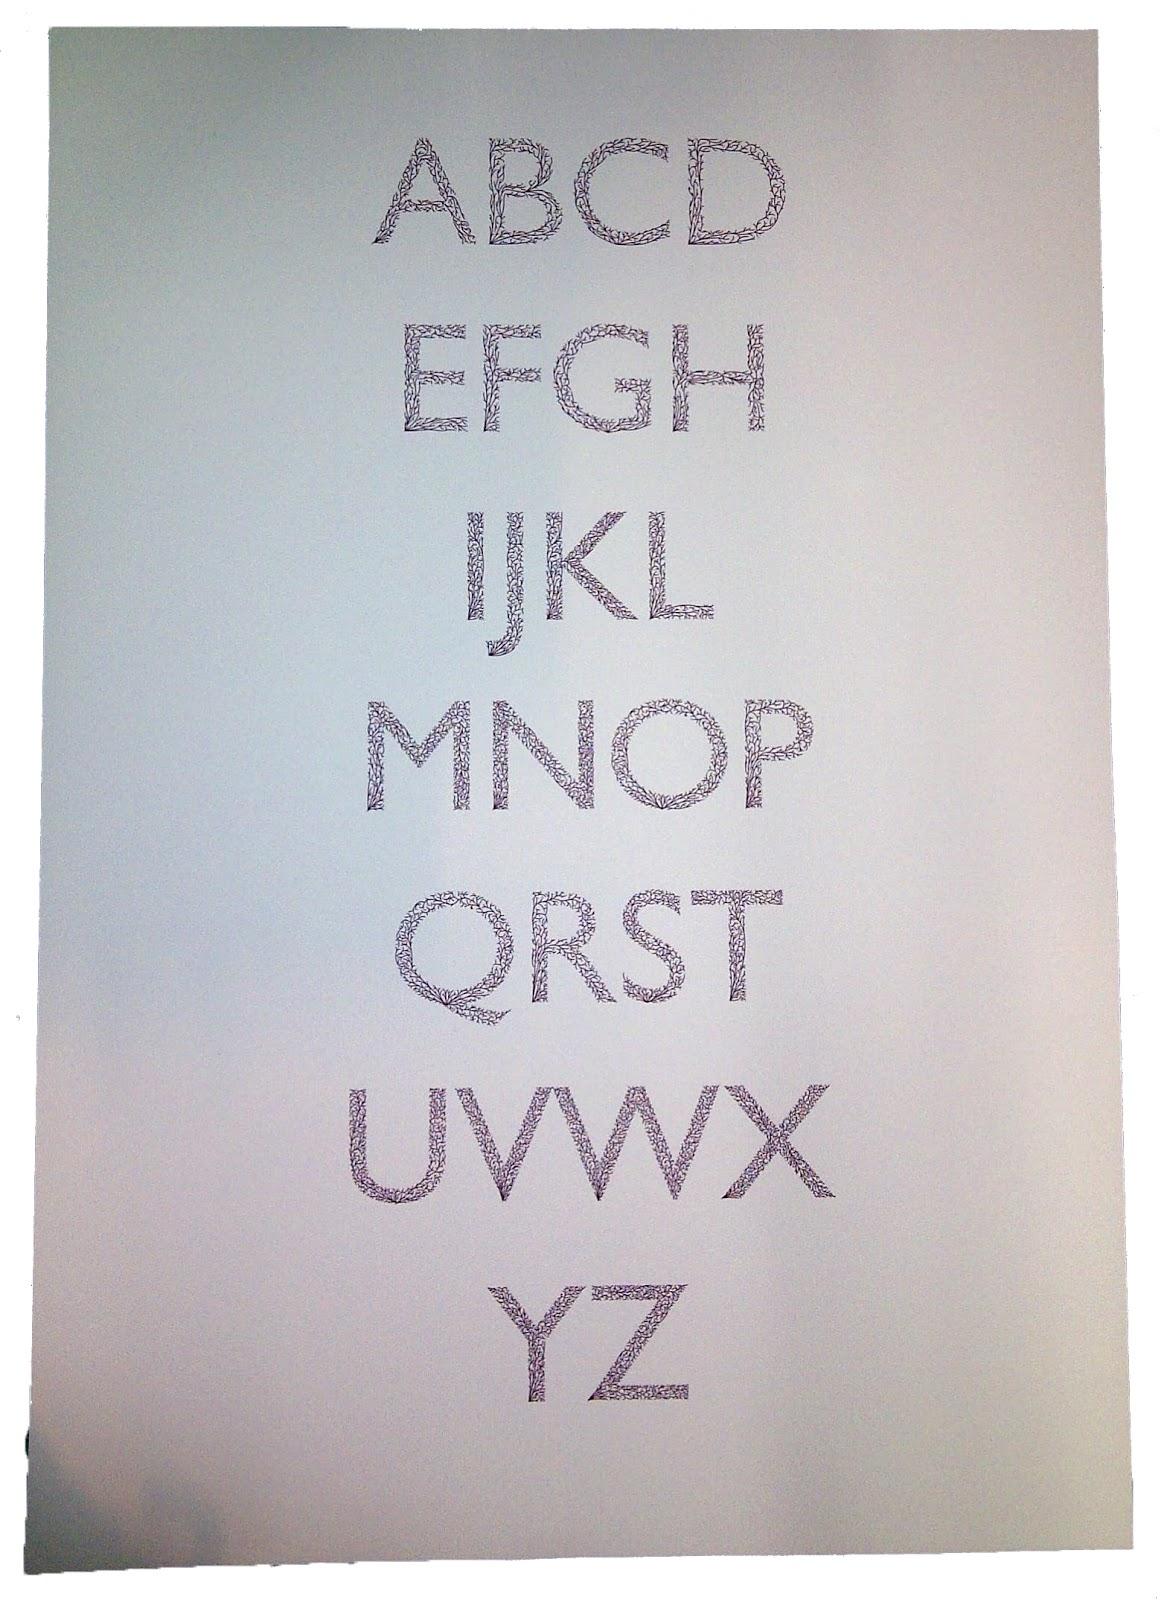 Design Practice Ougd403 Dissect Typeface On Illustrator